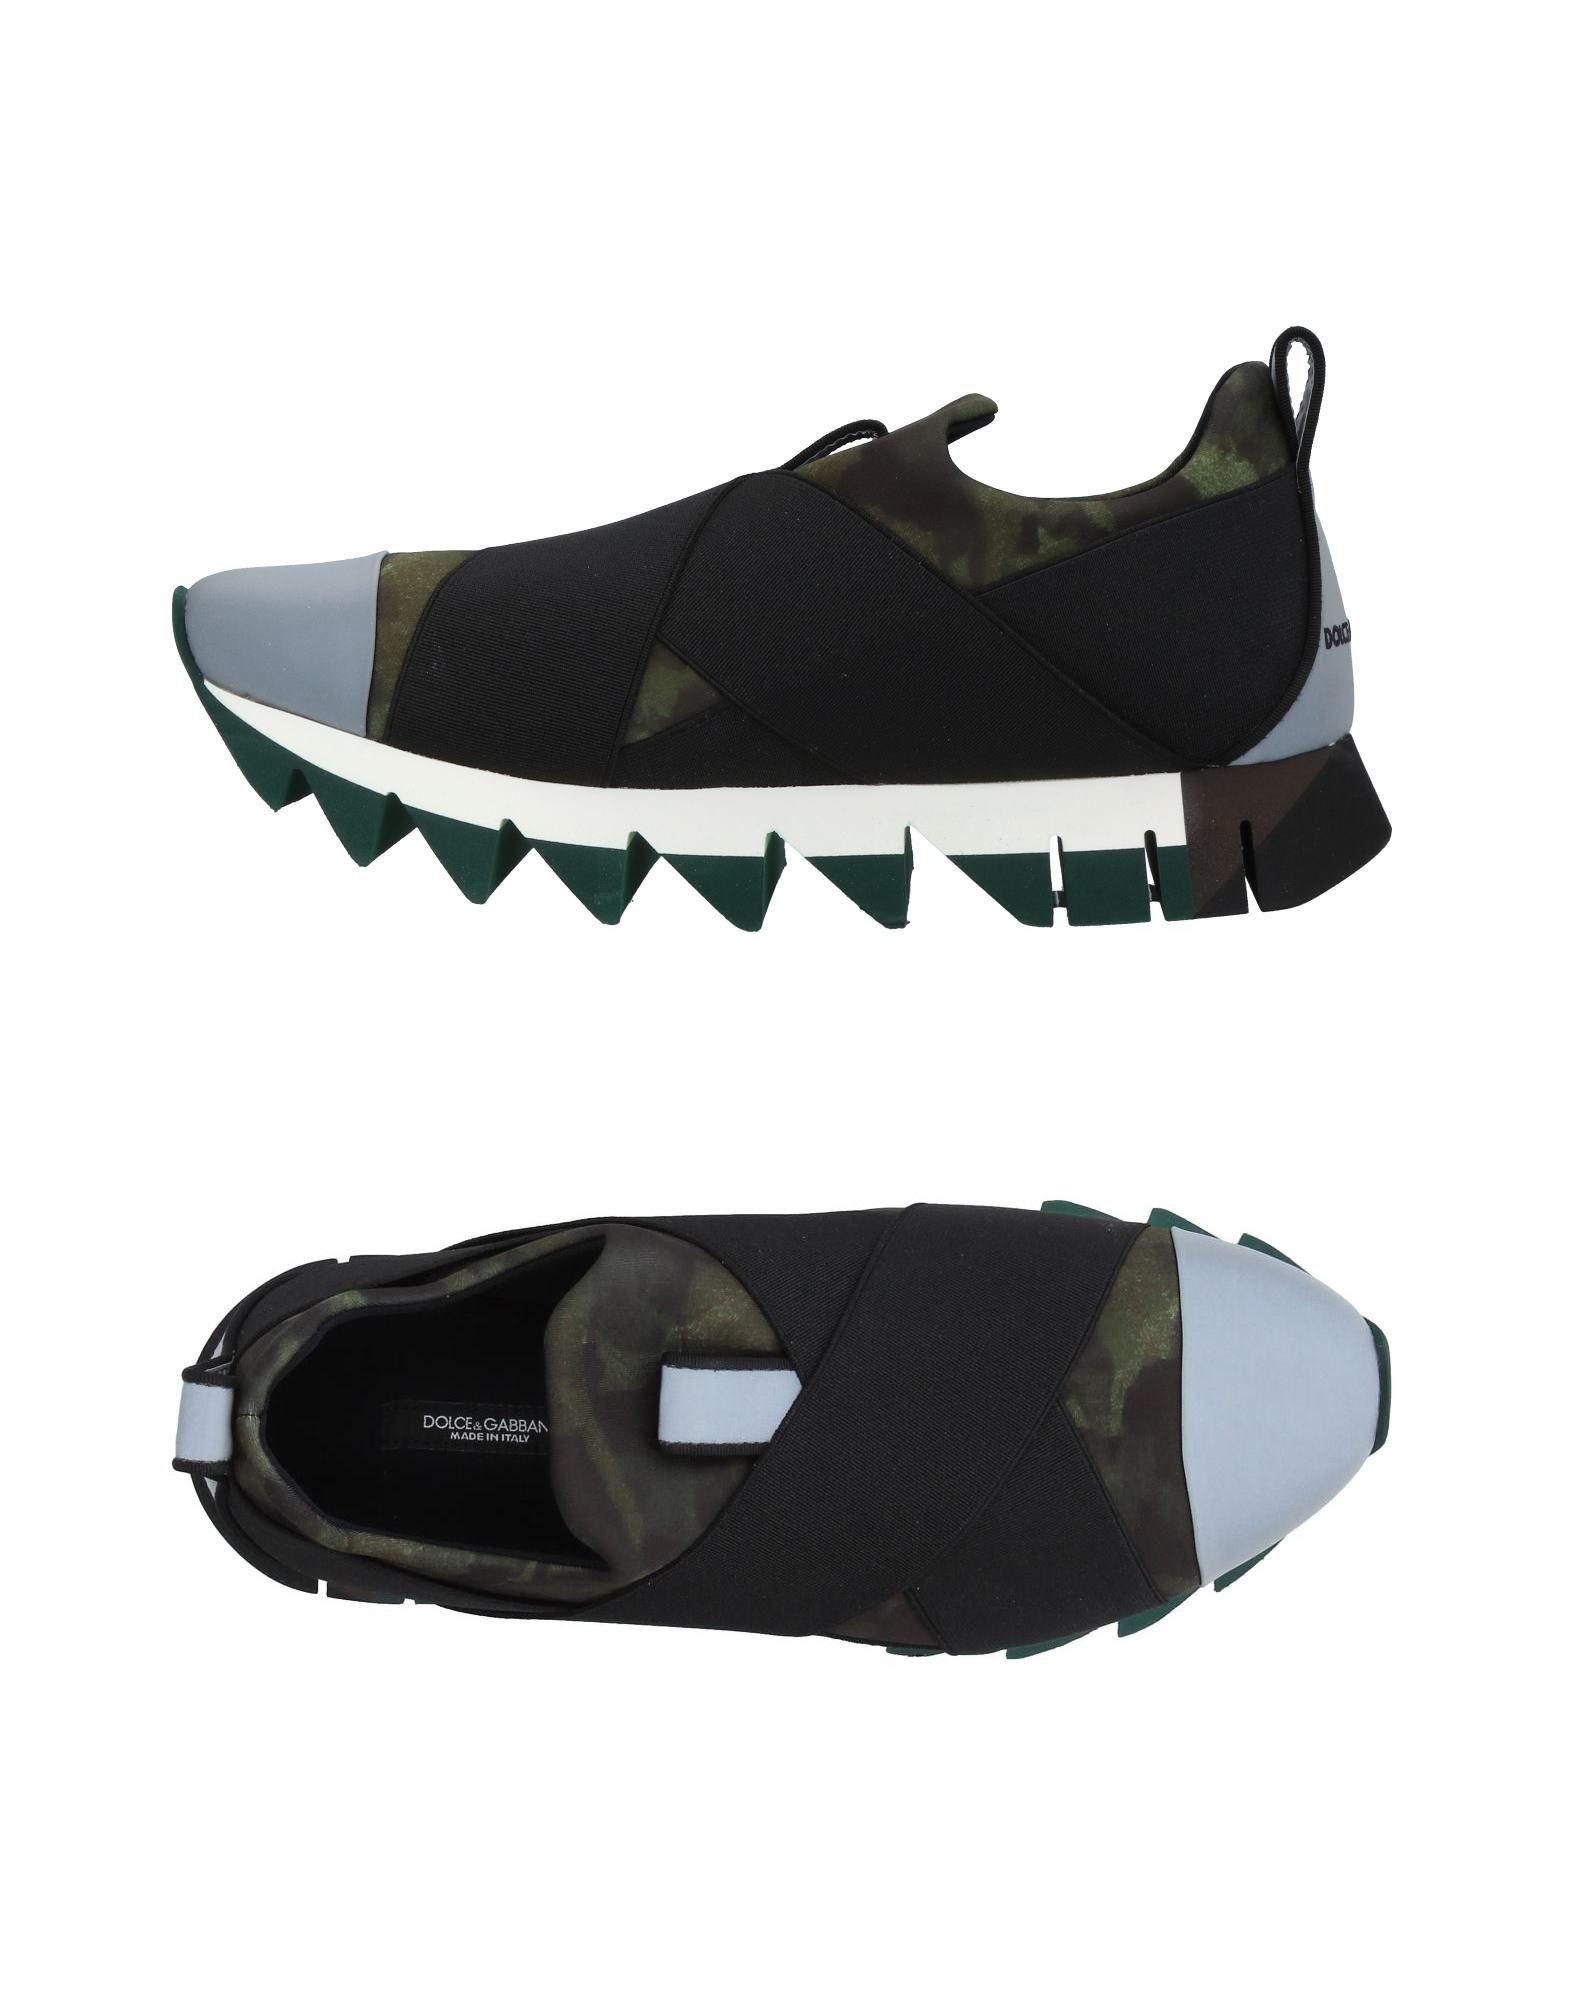 Dolce & Gabbana Sneakers Herren  11401808UI Gute Qualität beliebte Schuhe